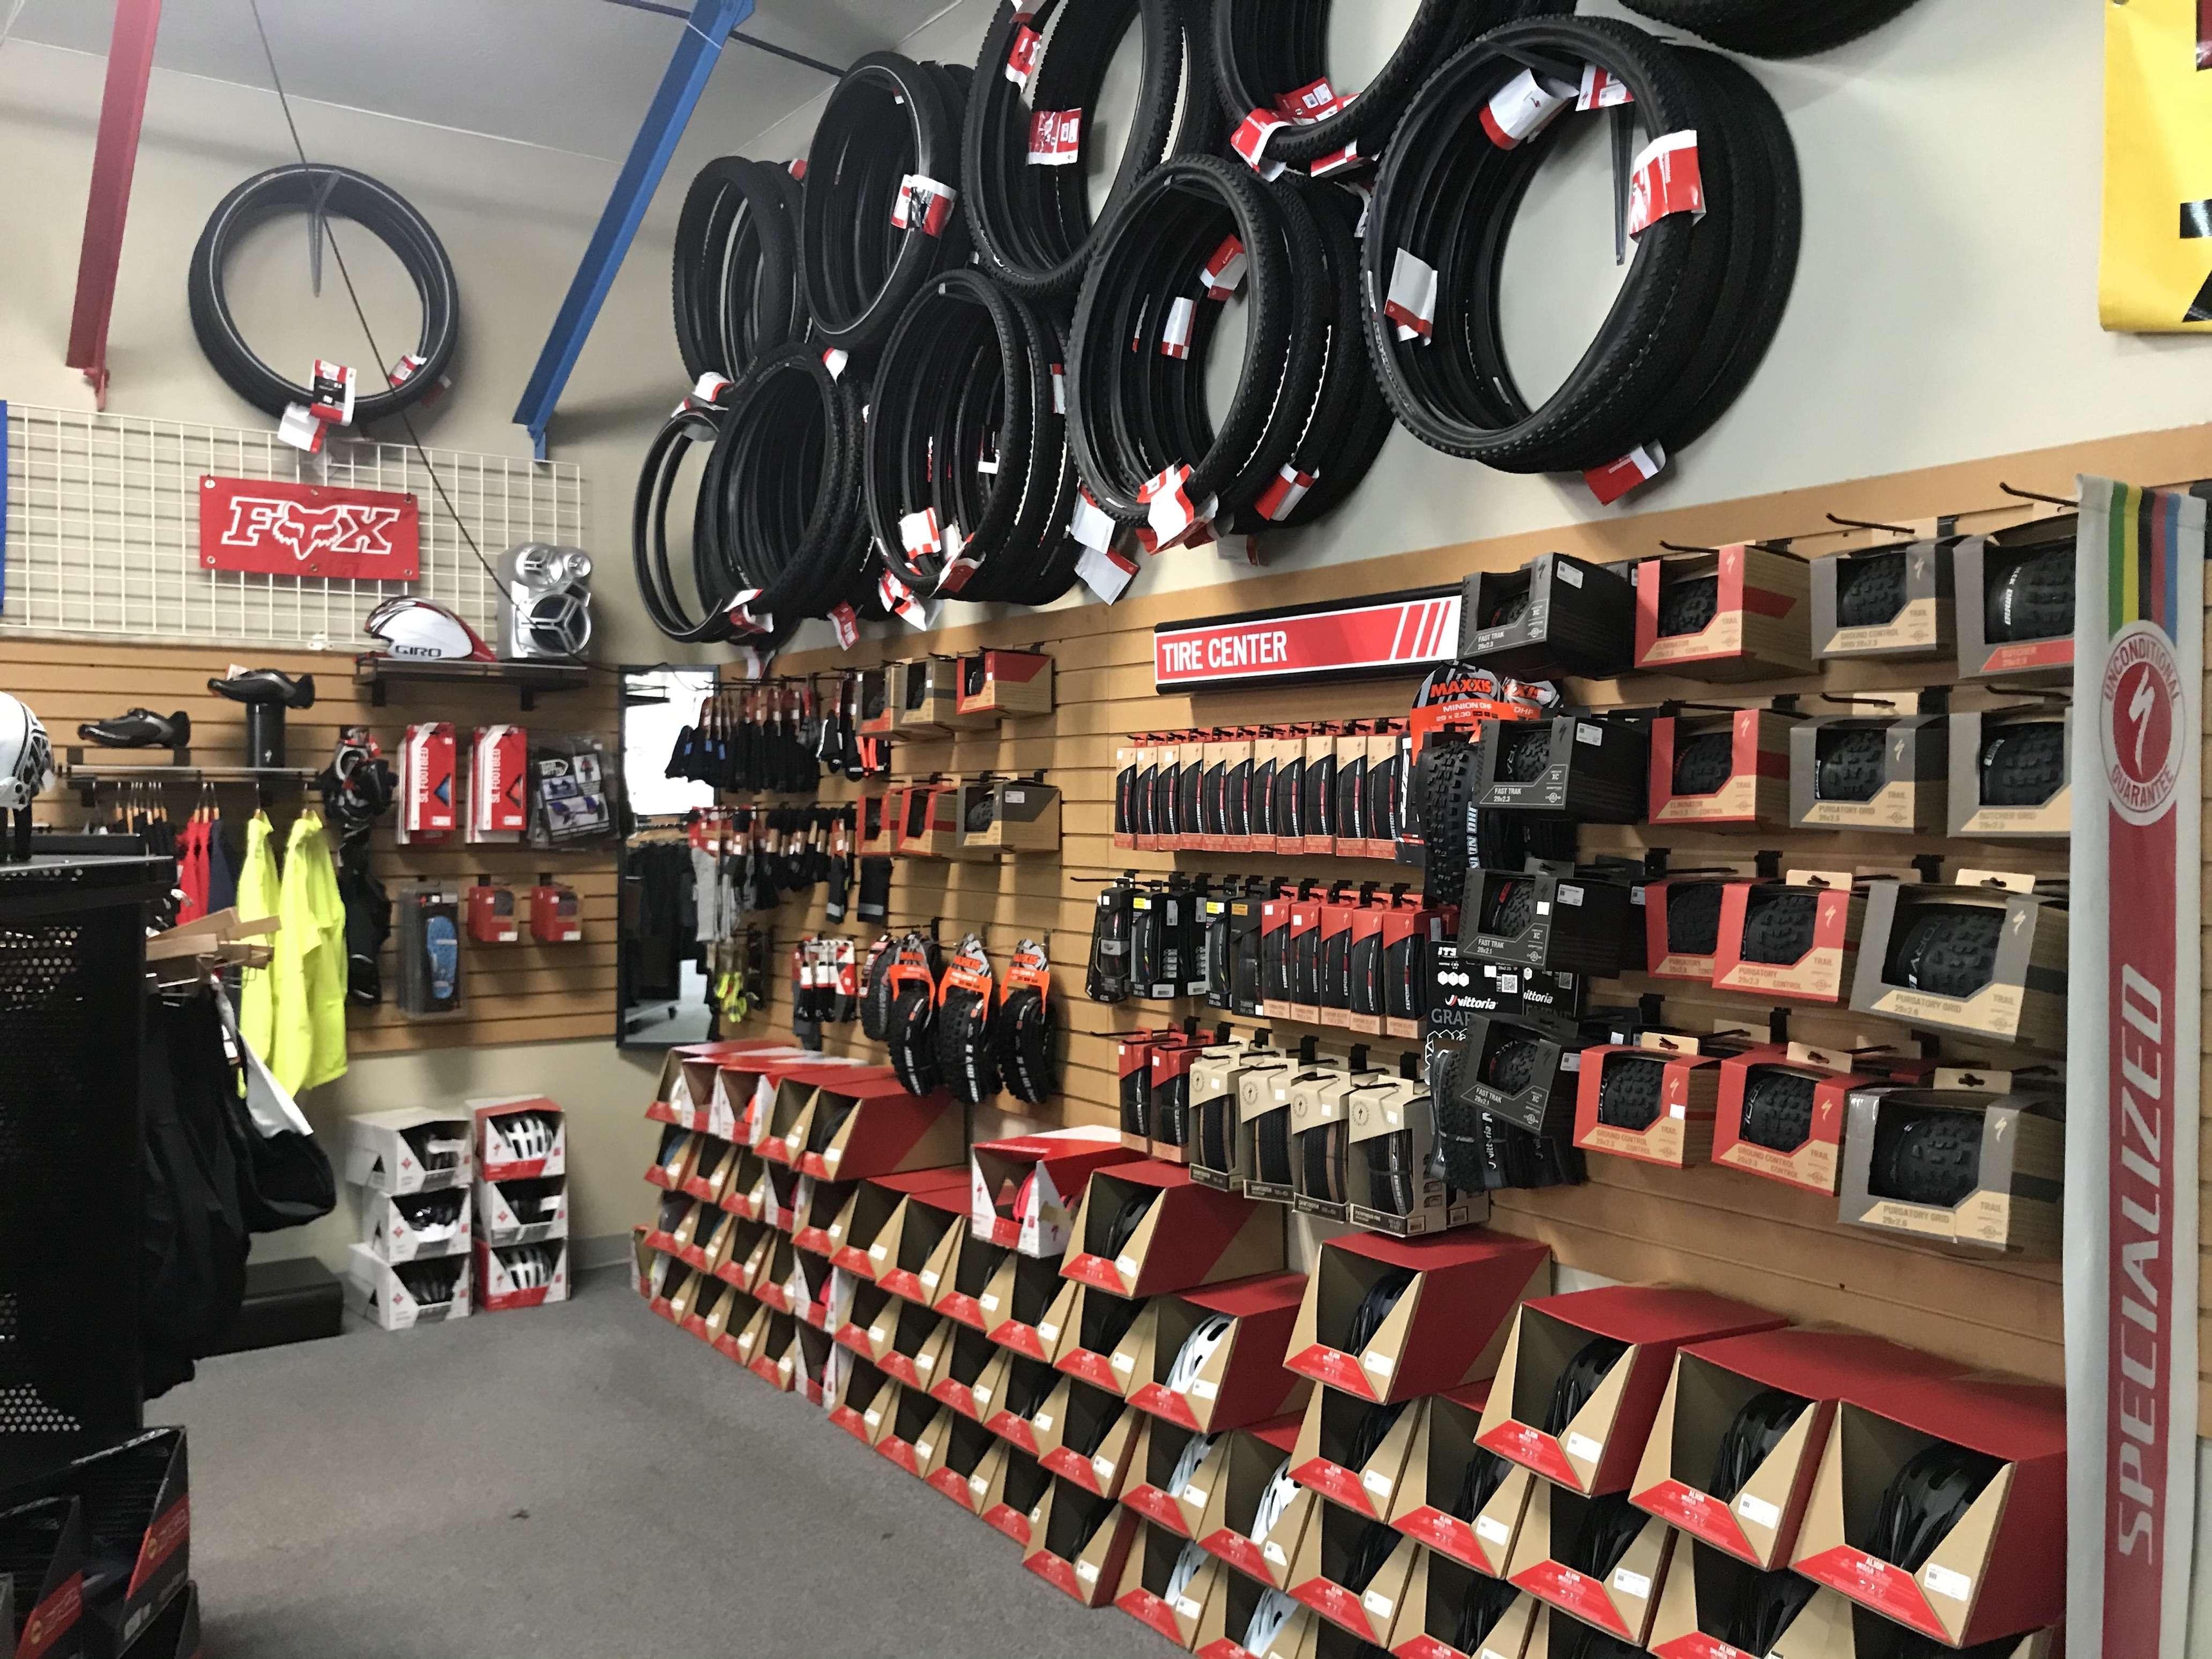 Bike Accessories in a Store Display